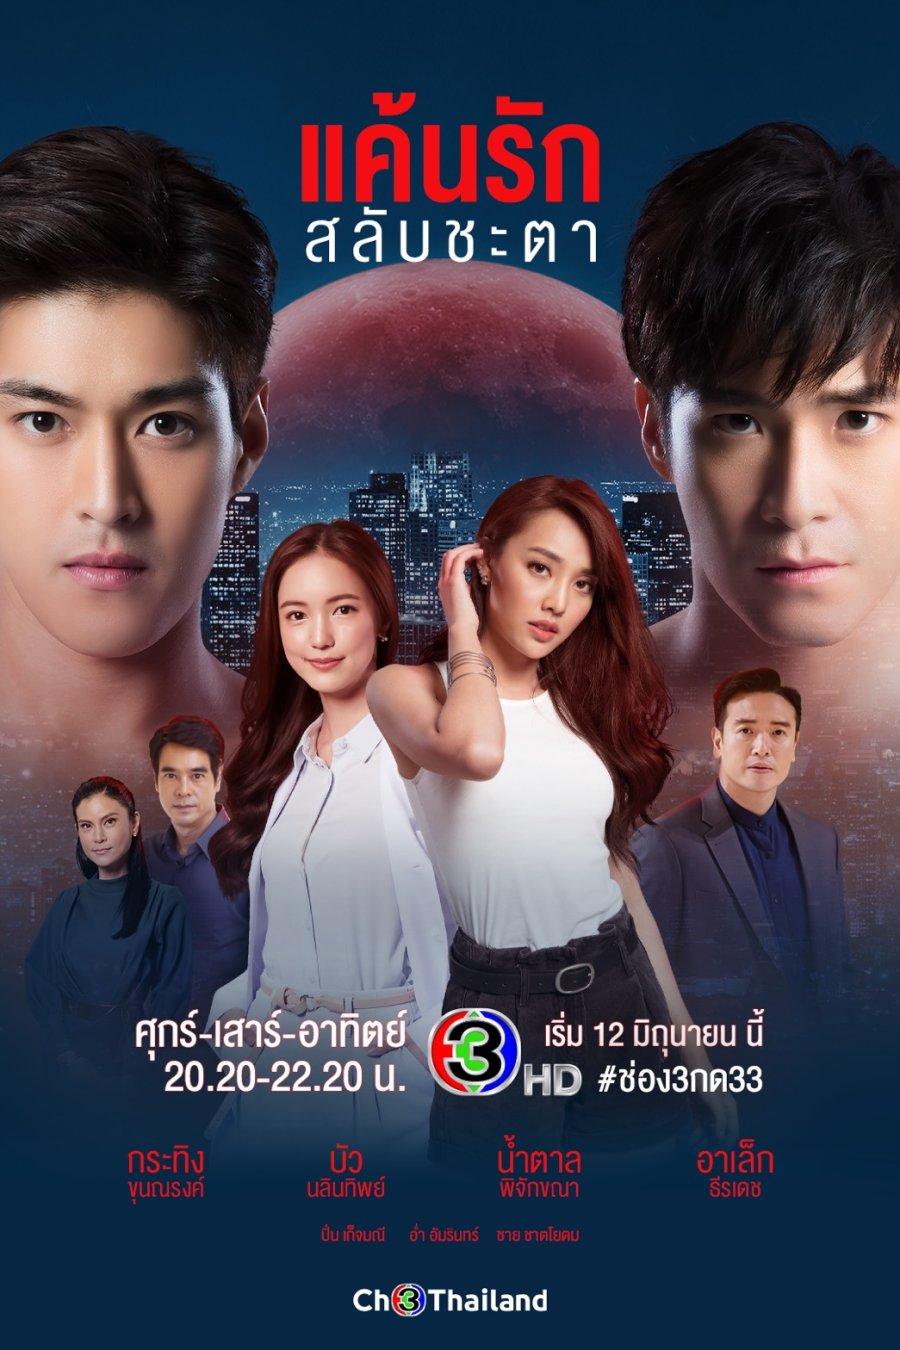 pZr8V 4f - Любовь, меняющая судьбы ✸ 2021 ✸ Таиланд